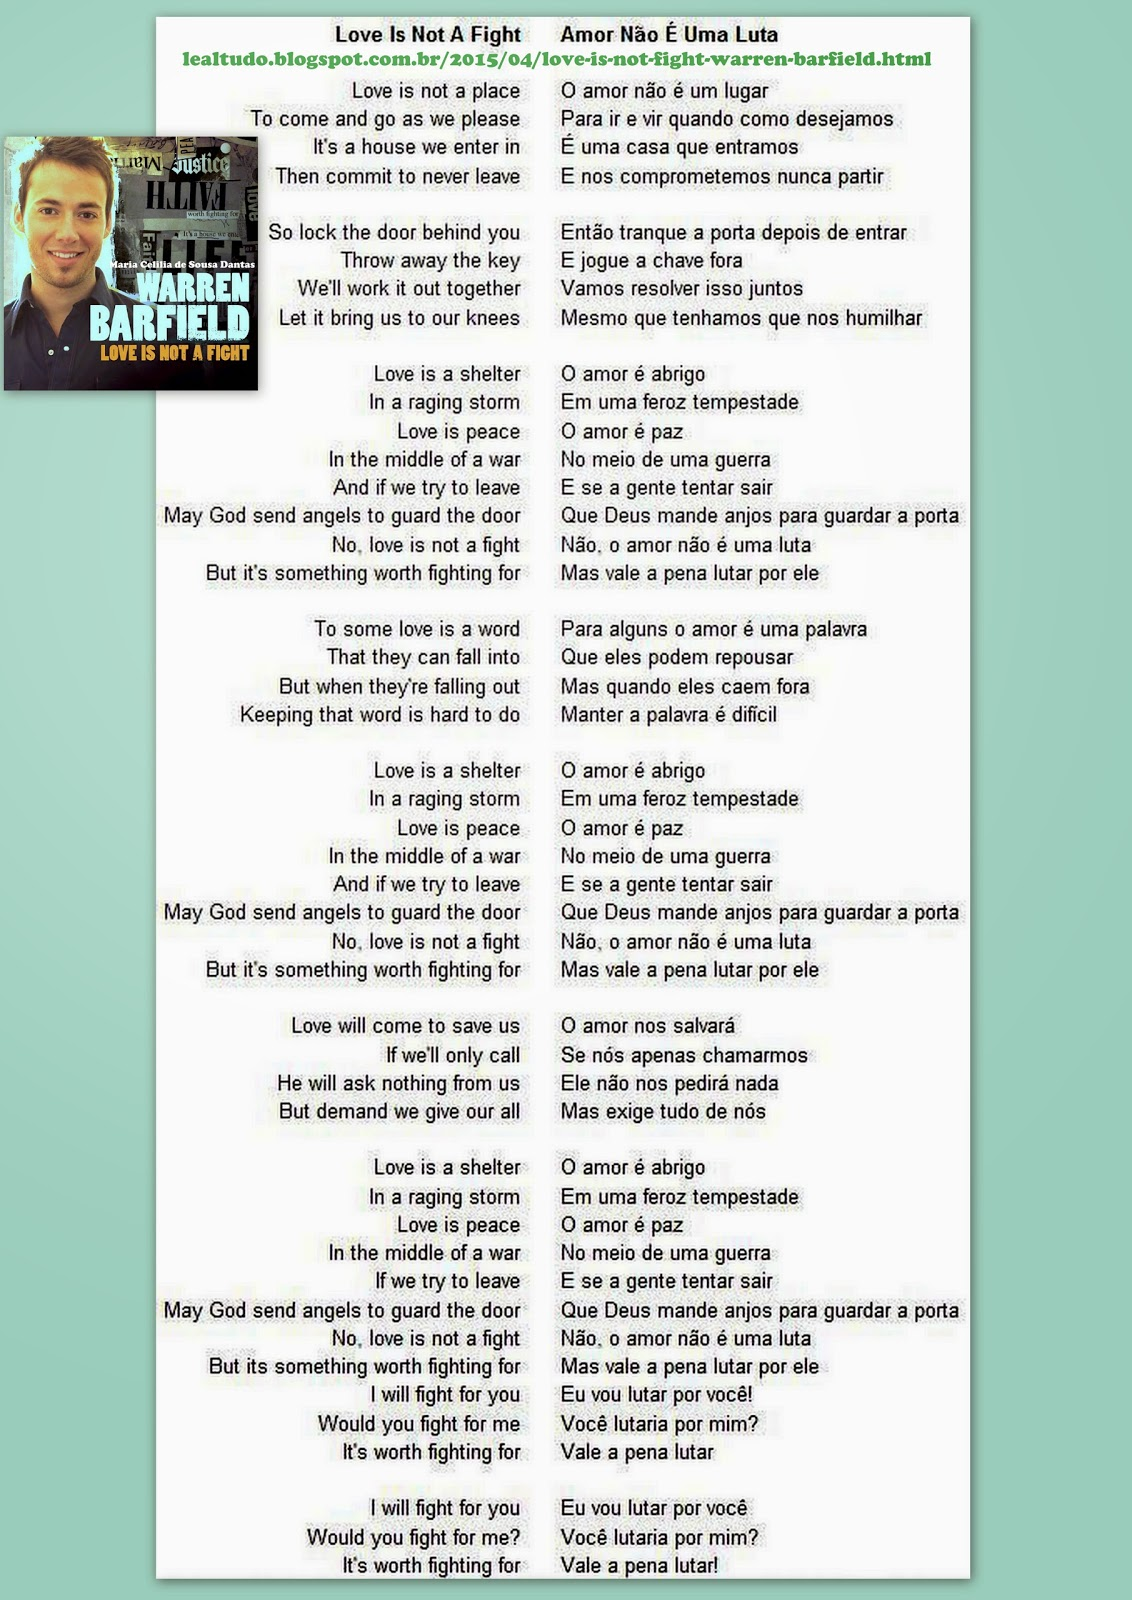 LOVE IS NOT A FIGHT Warren Barfield Lyrics Letra da Música Tradução Português Brasil Online Ouvir assistir Clipe Musical